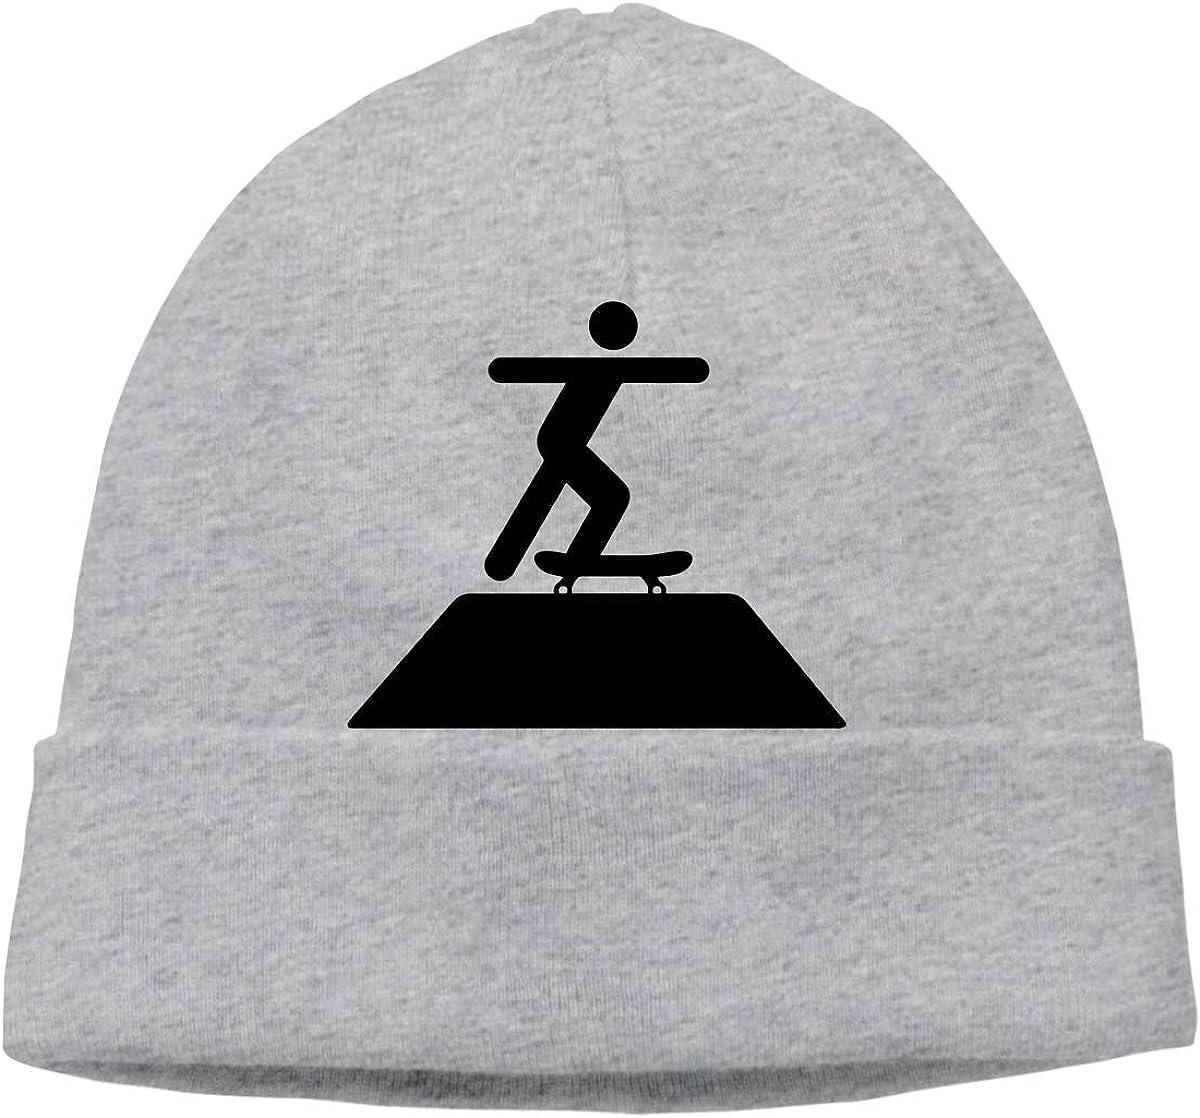 Mens and Womens Skullies Beanies Skateboard Skater Vintage Skull Cap Sports /& Outdoors Knit Hat Gray